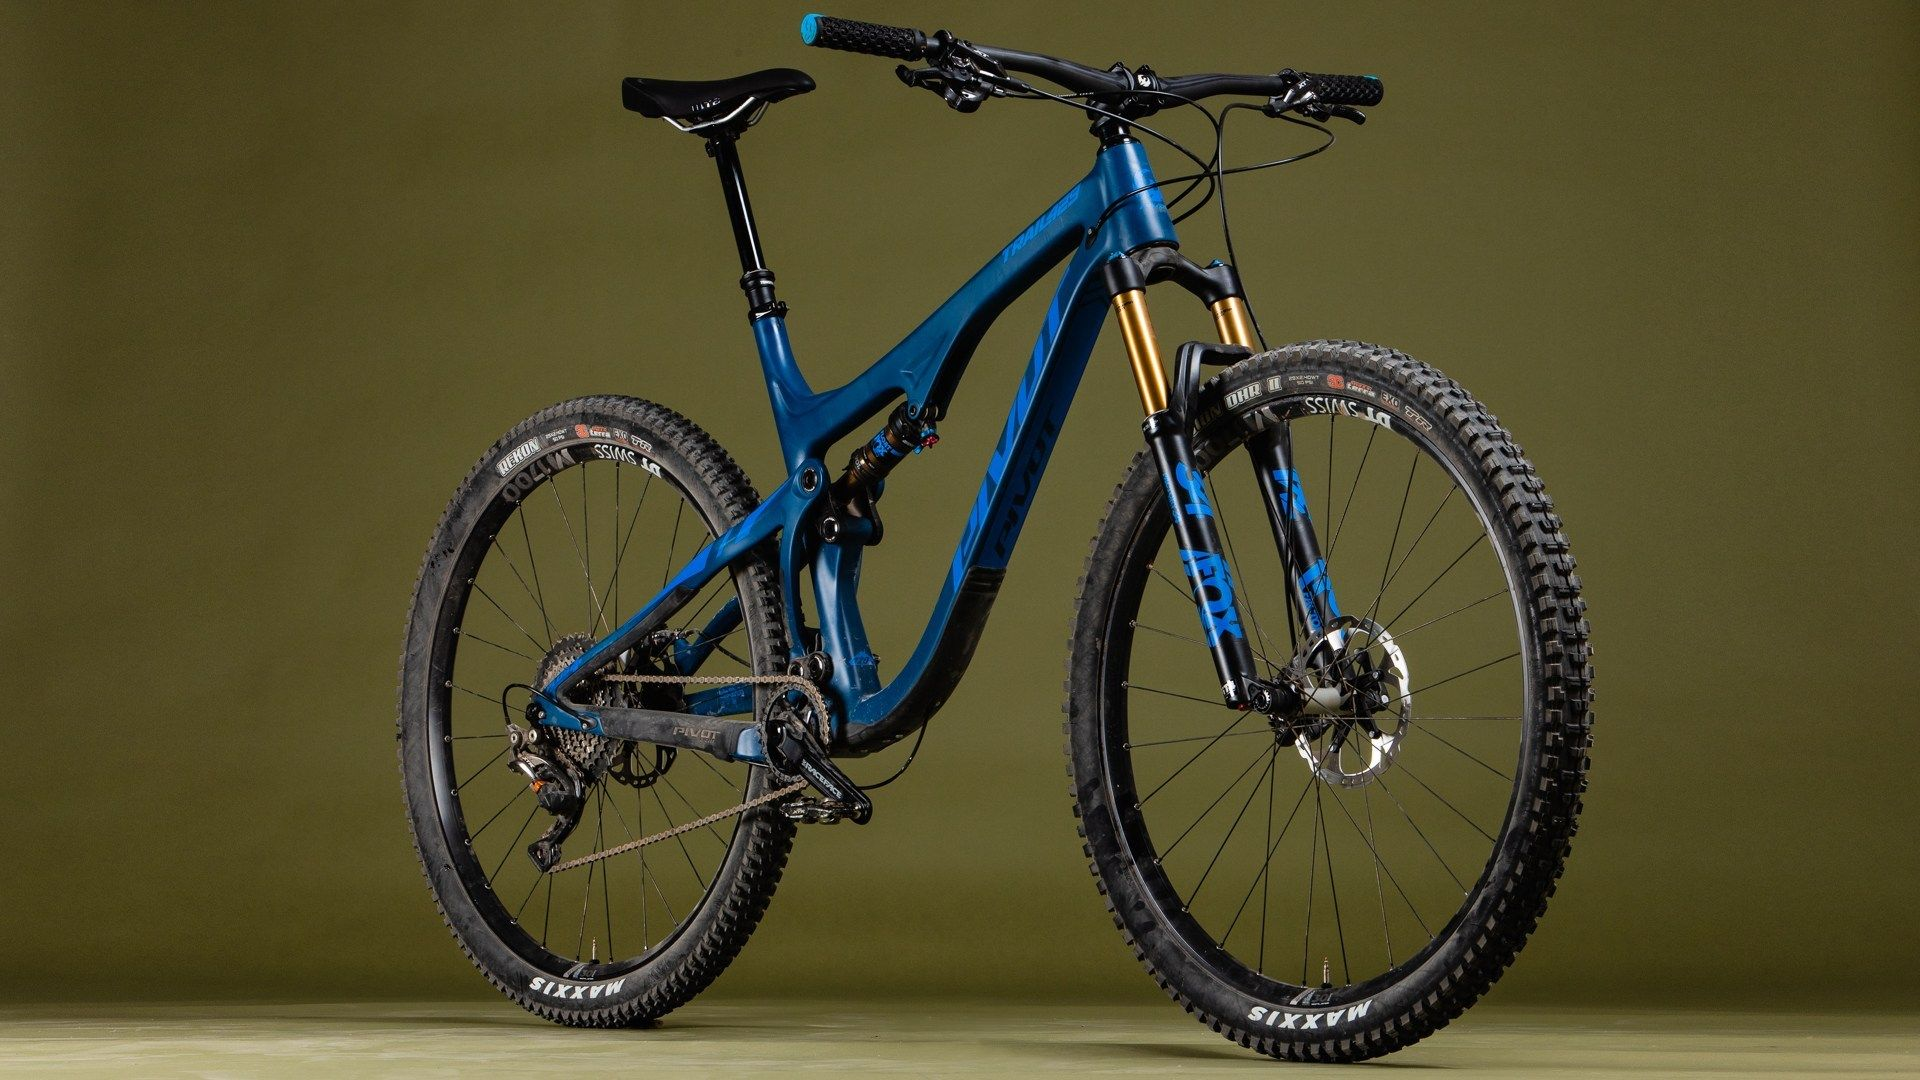 Pivot Trail 429 Pro Xt Xtr In 2020 Bike Magazine Bike Speed Bike